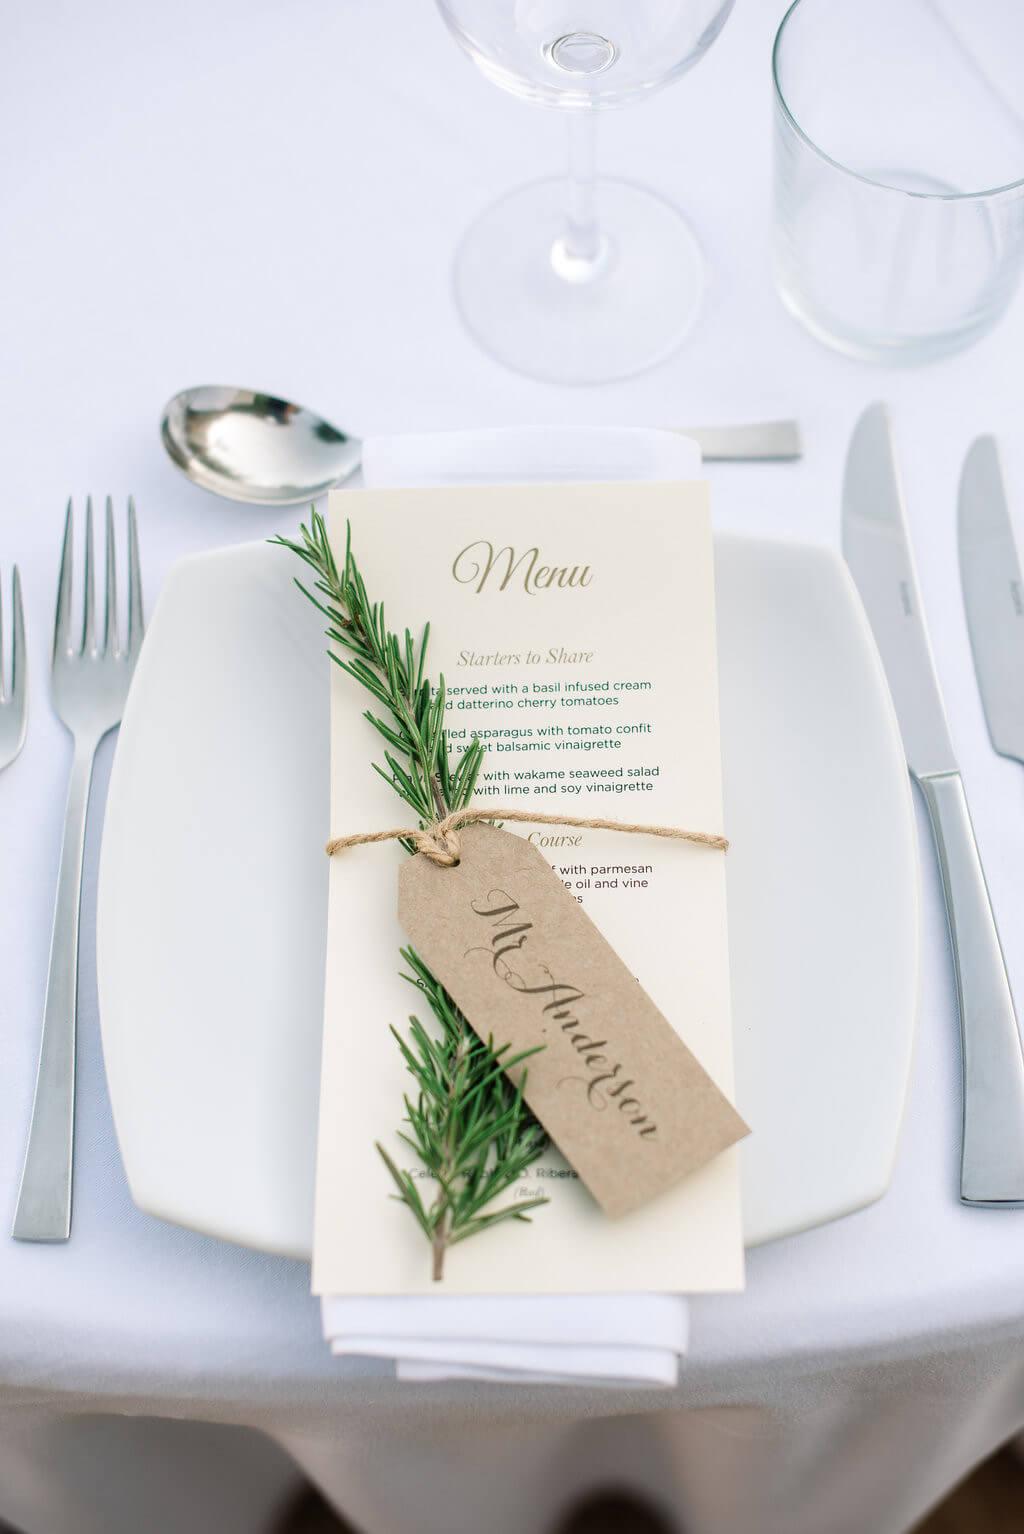 https://www.white-ibiza.com/wp-content/uploads/2020/03/ibiza-wedding-venues-amante-ibiza-2020-05.jpg